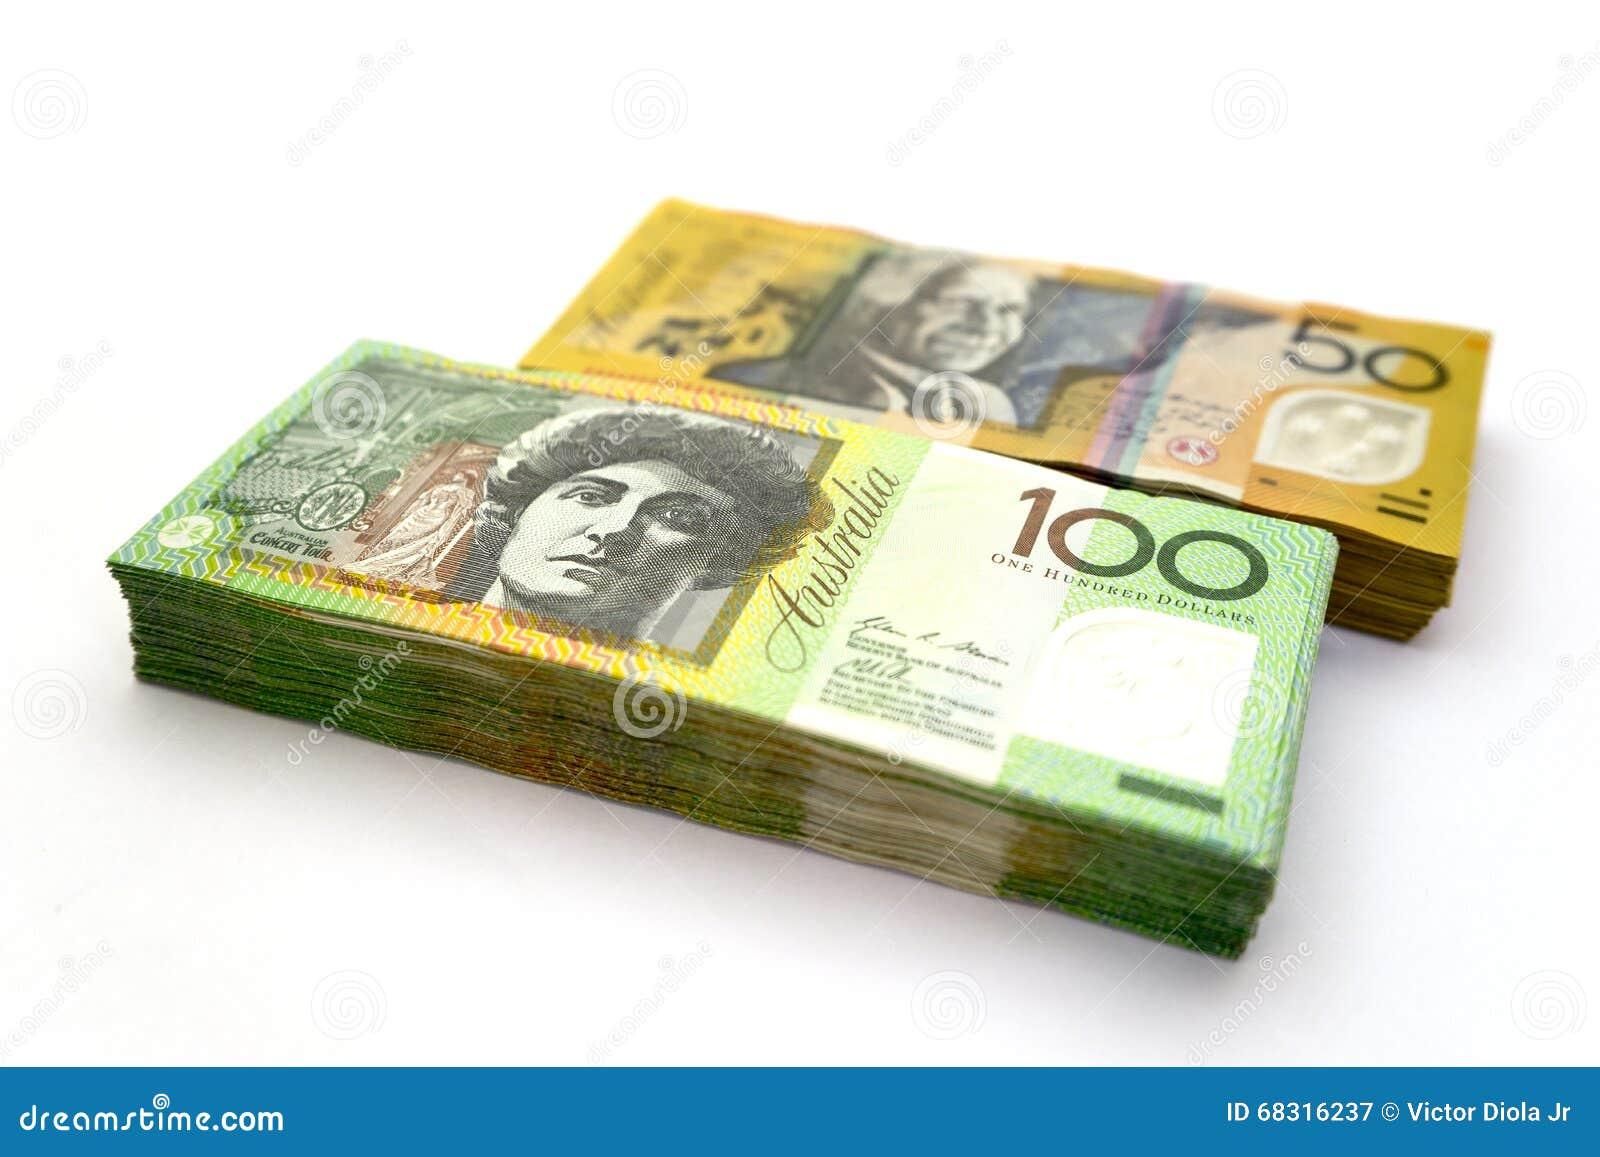 how to make a fifety dolar notes australia